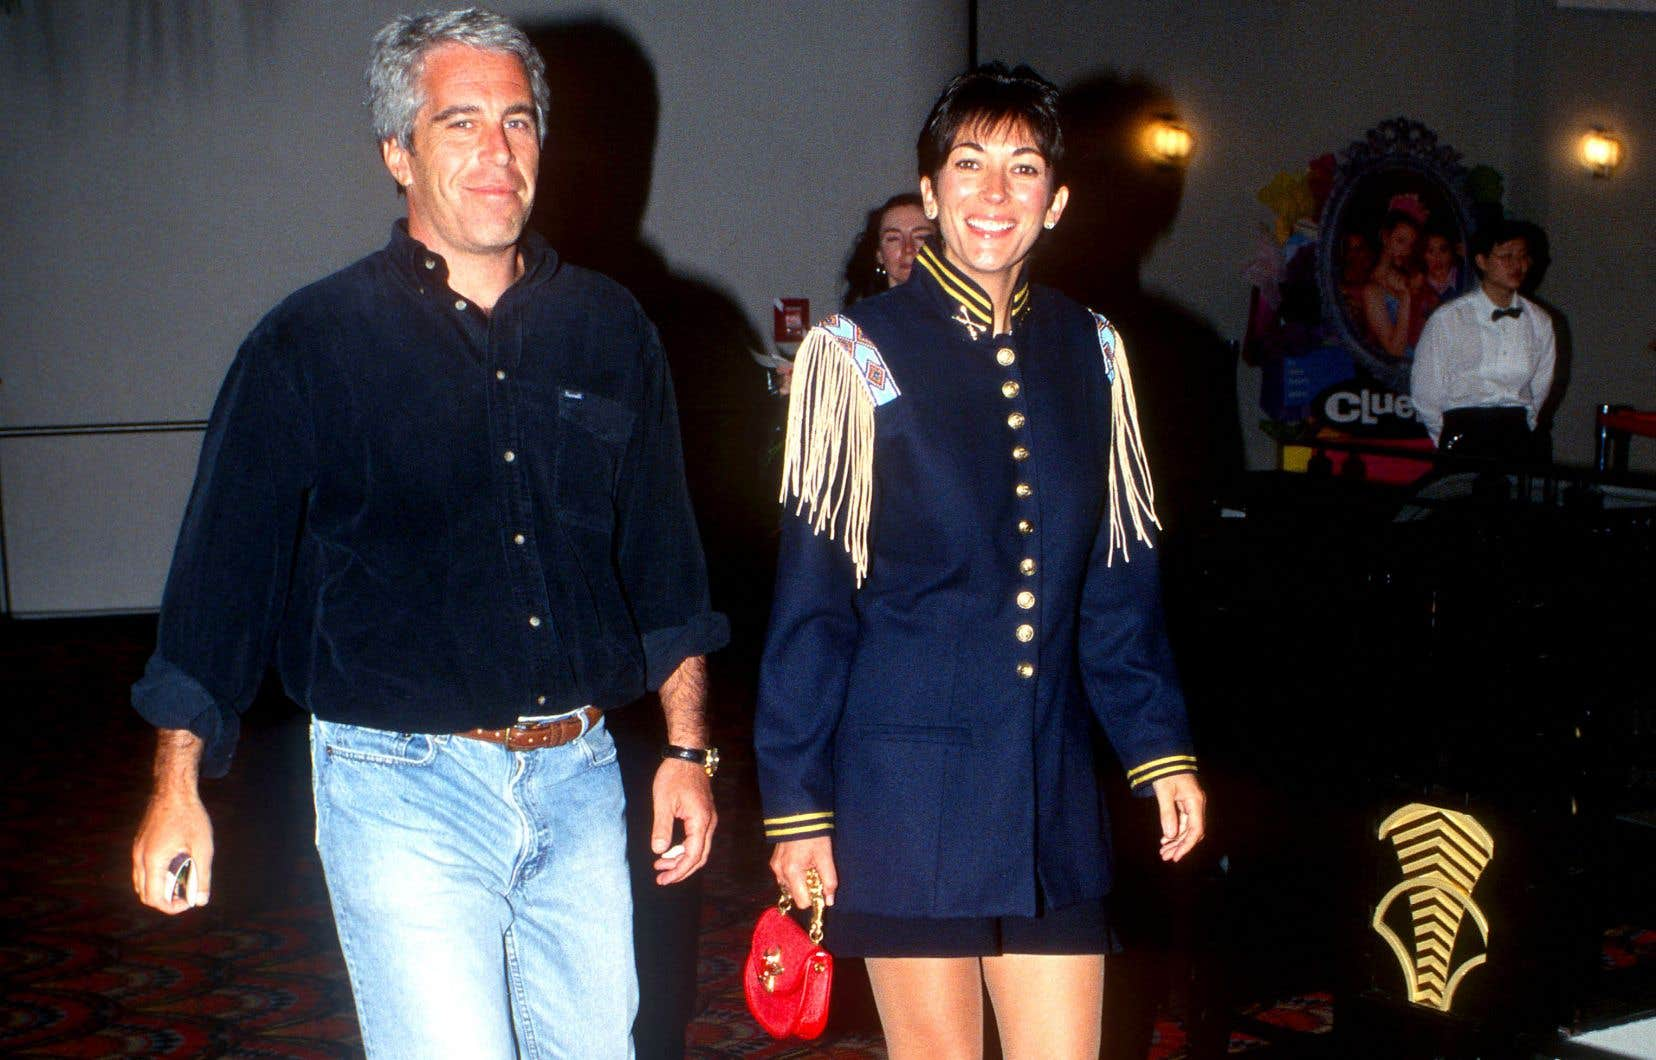 Jeffrey Epstein et Ghislaine Maxwell, le 13juin 1995 à New York